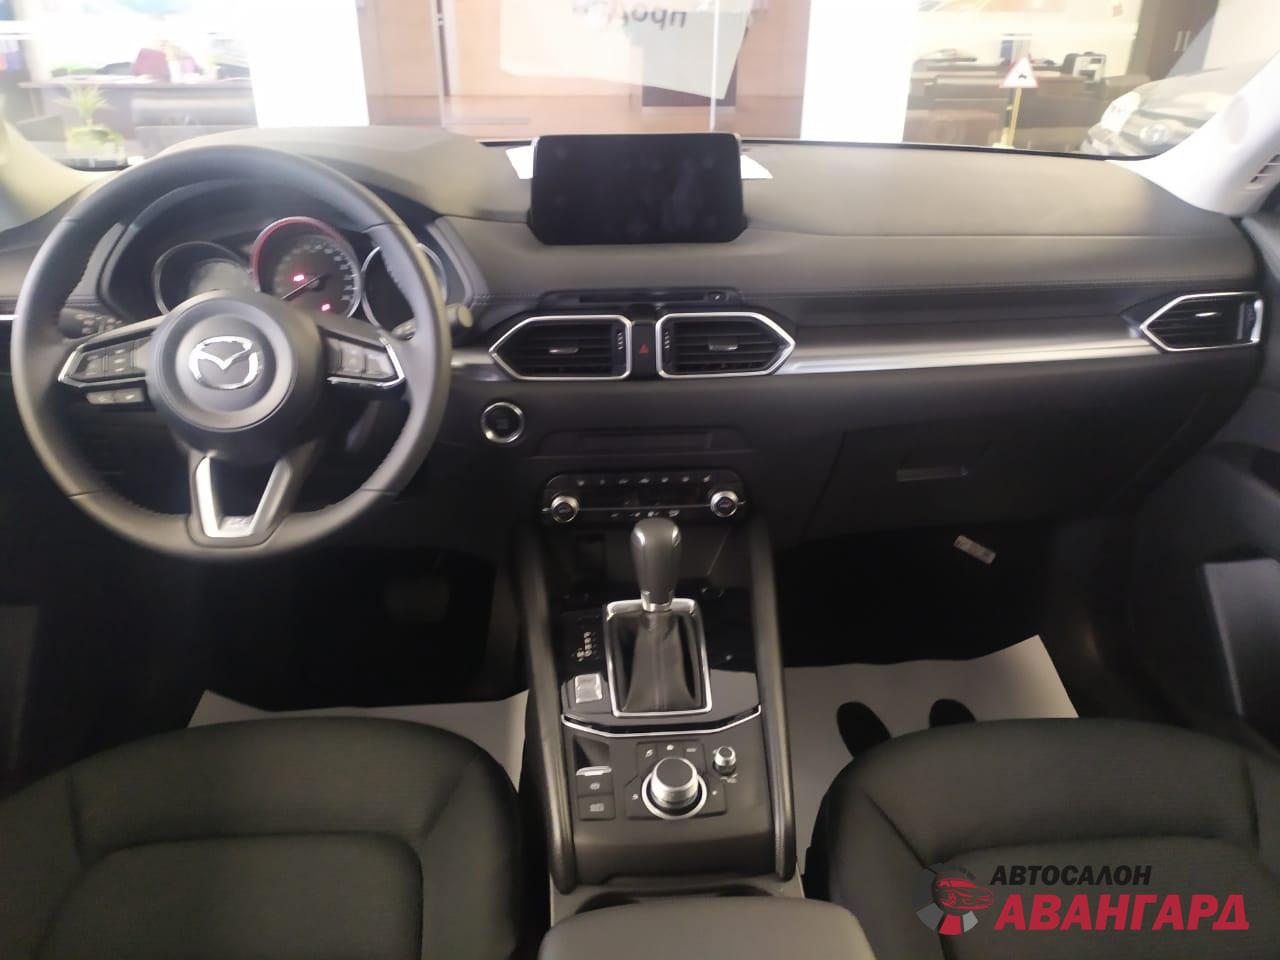 НОВЫЙ Mazda CX-5 2.0 SKY 150 л.с. 6AT 2WD Active Sonic Silver (серебро)